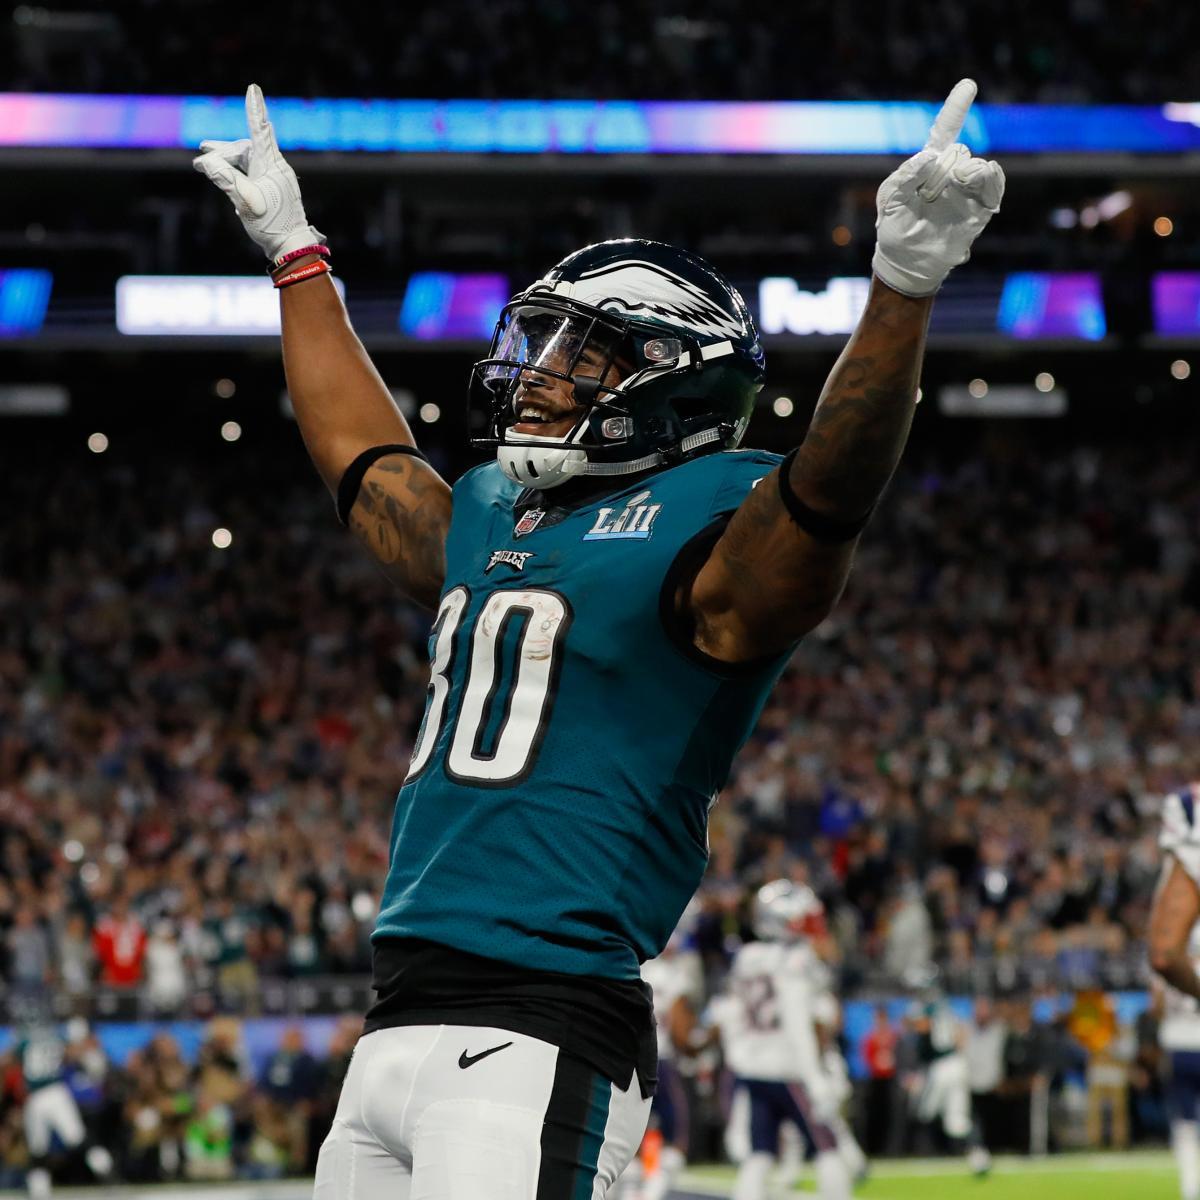 Fantasy Football Rankings 2018: Advice For Dynasty And